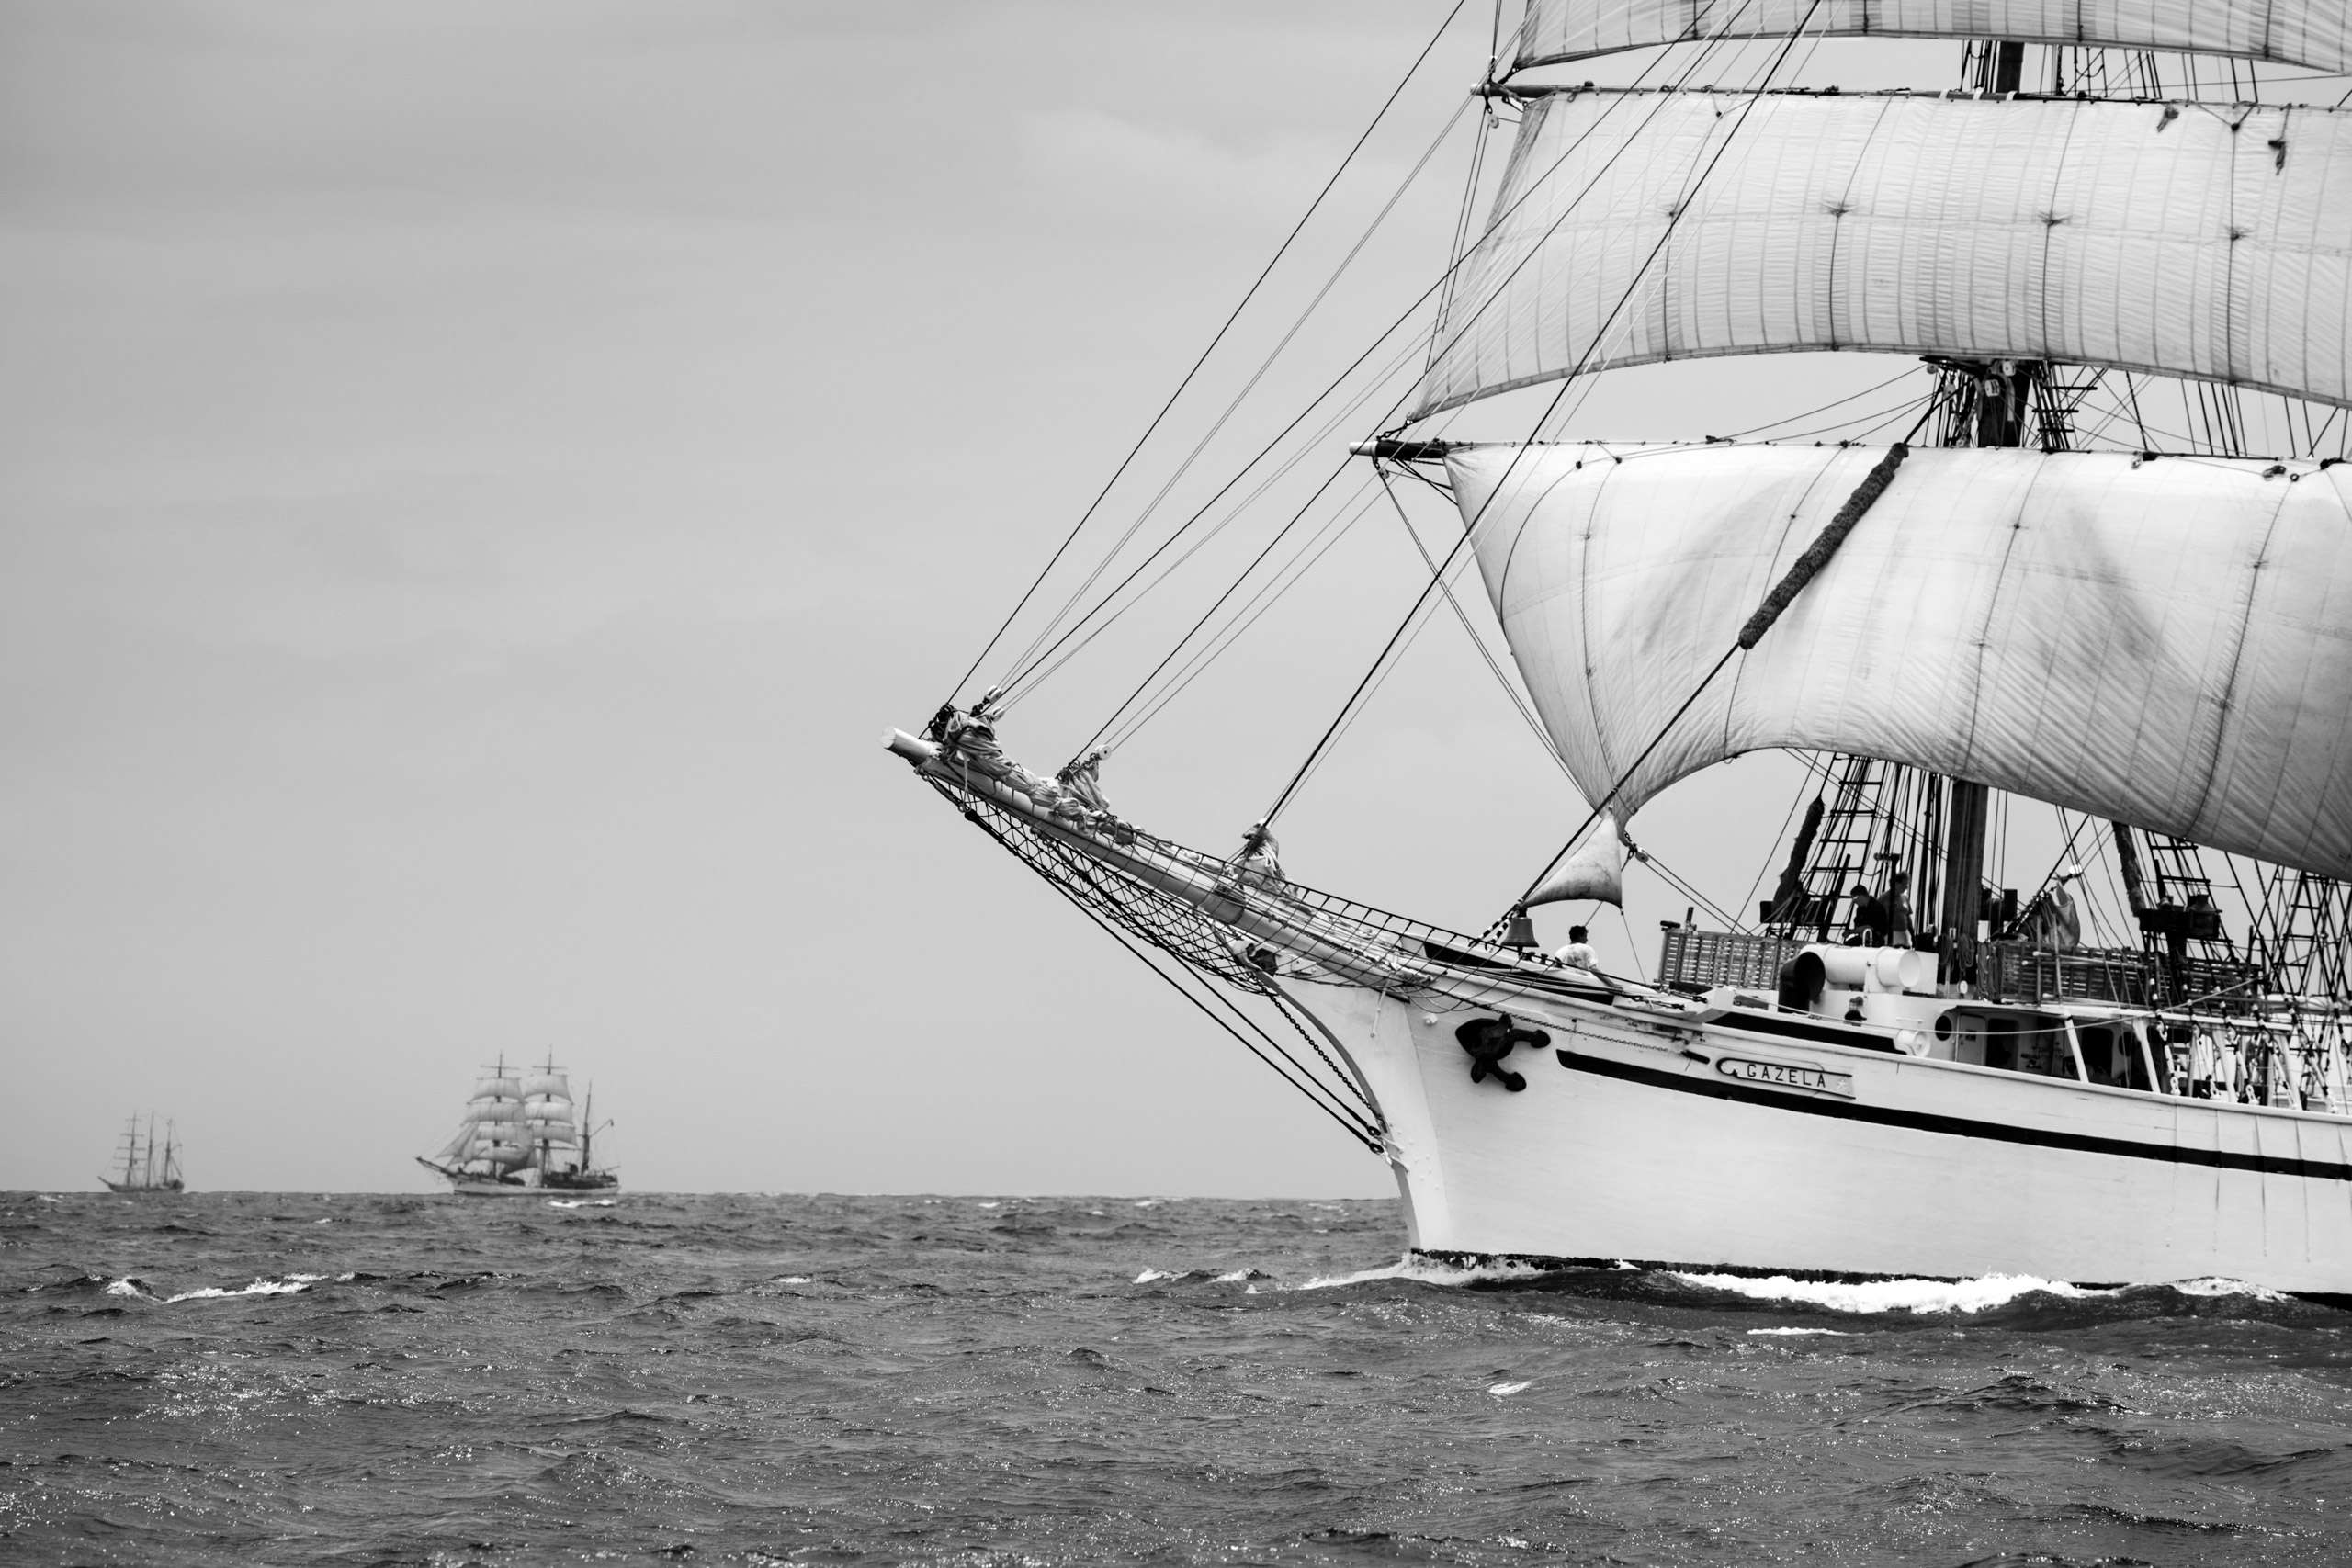 Portfolio -Sailing - Tall Ships #27 - PCG764